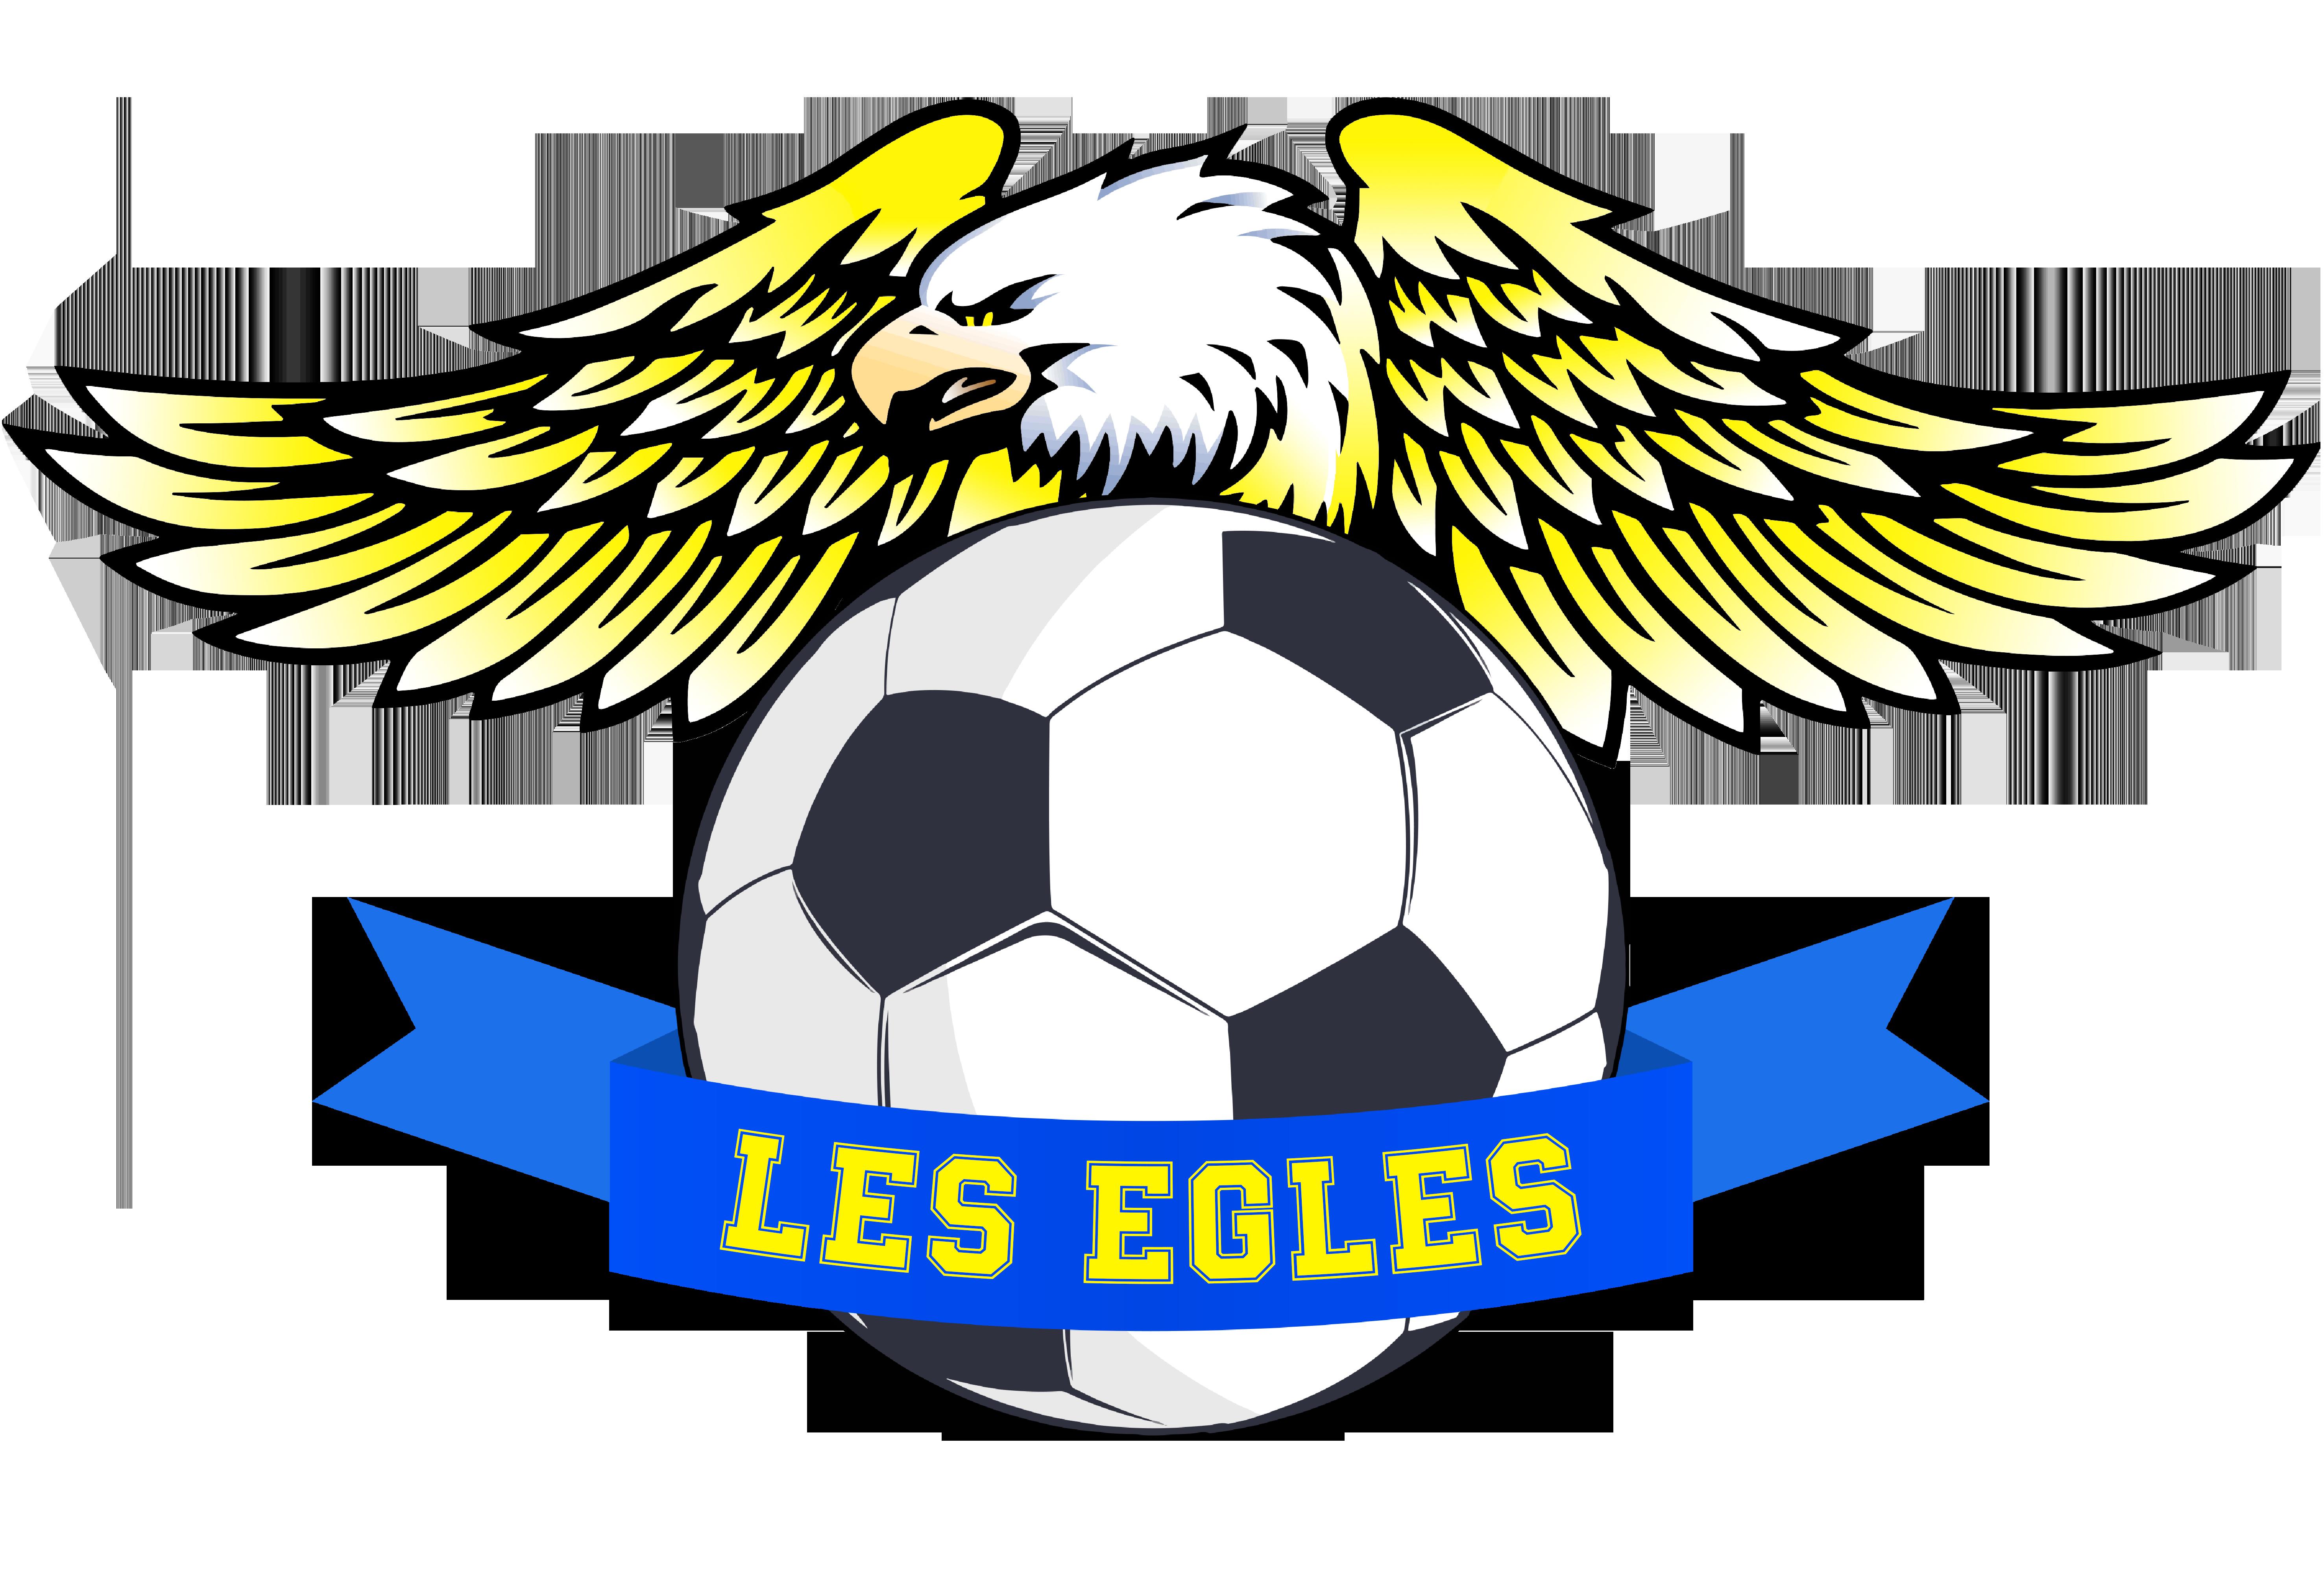 Les Egles lesegles.ch